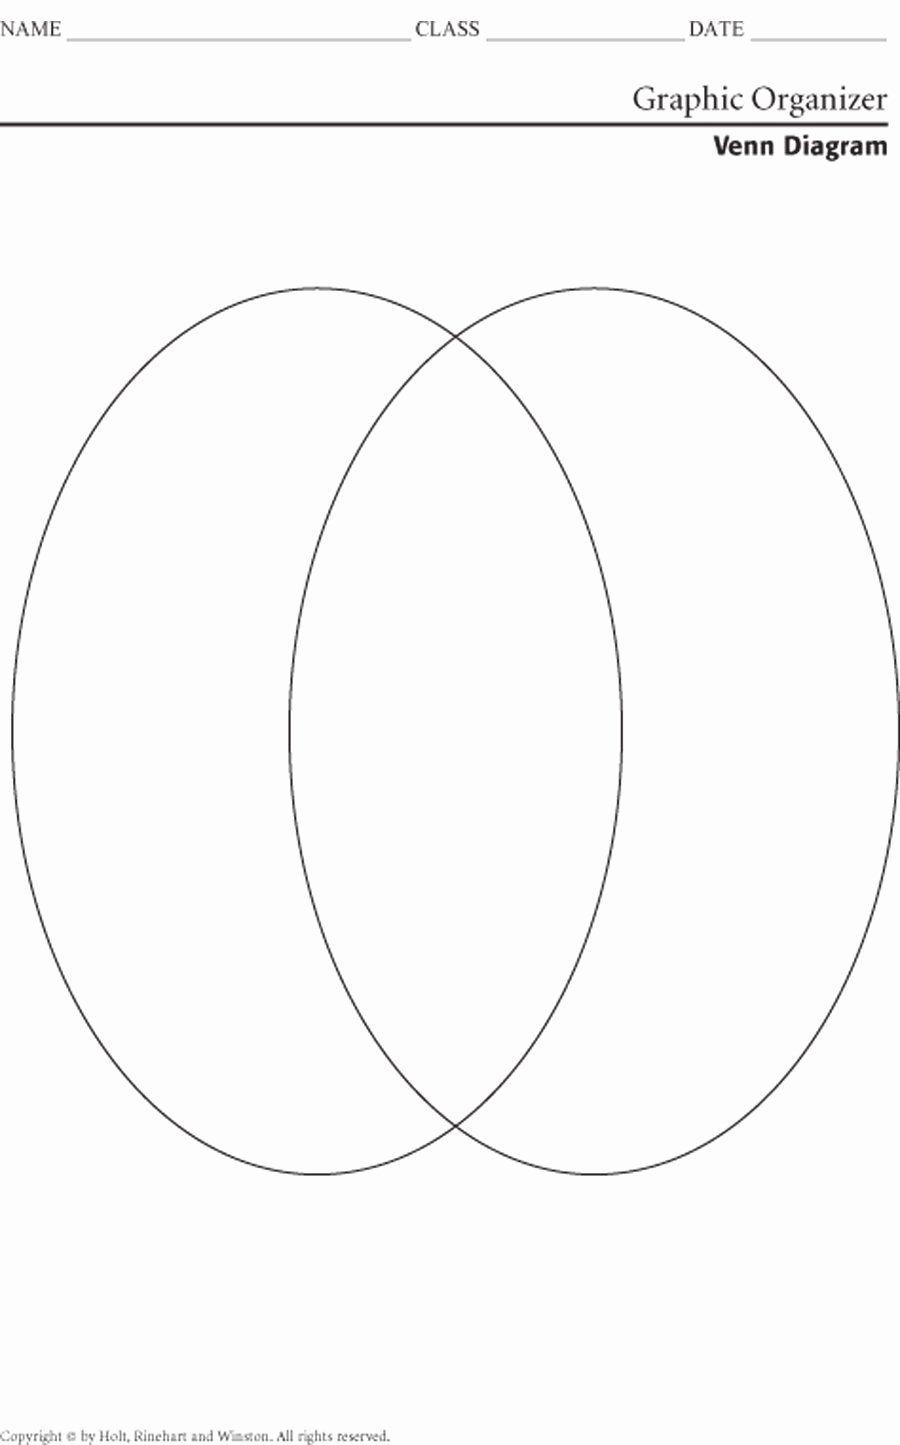 Venn Diagram Template Word New Printable Venn Diagram 2 Circles In 2020 Venn Diagram Template Venn Diagram Printable Venn Diagram